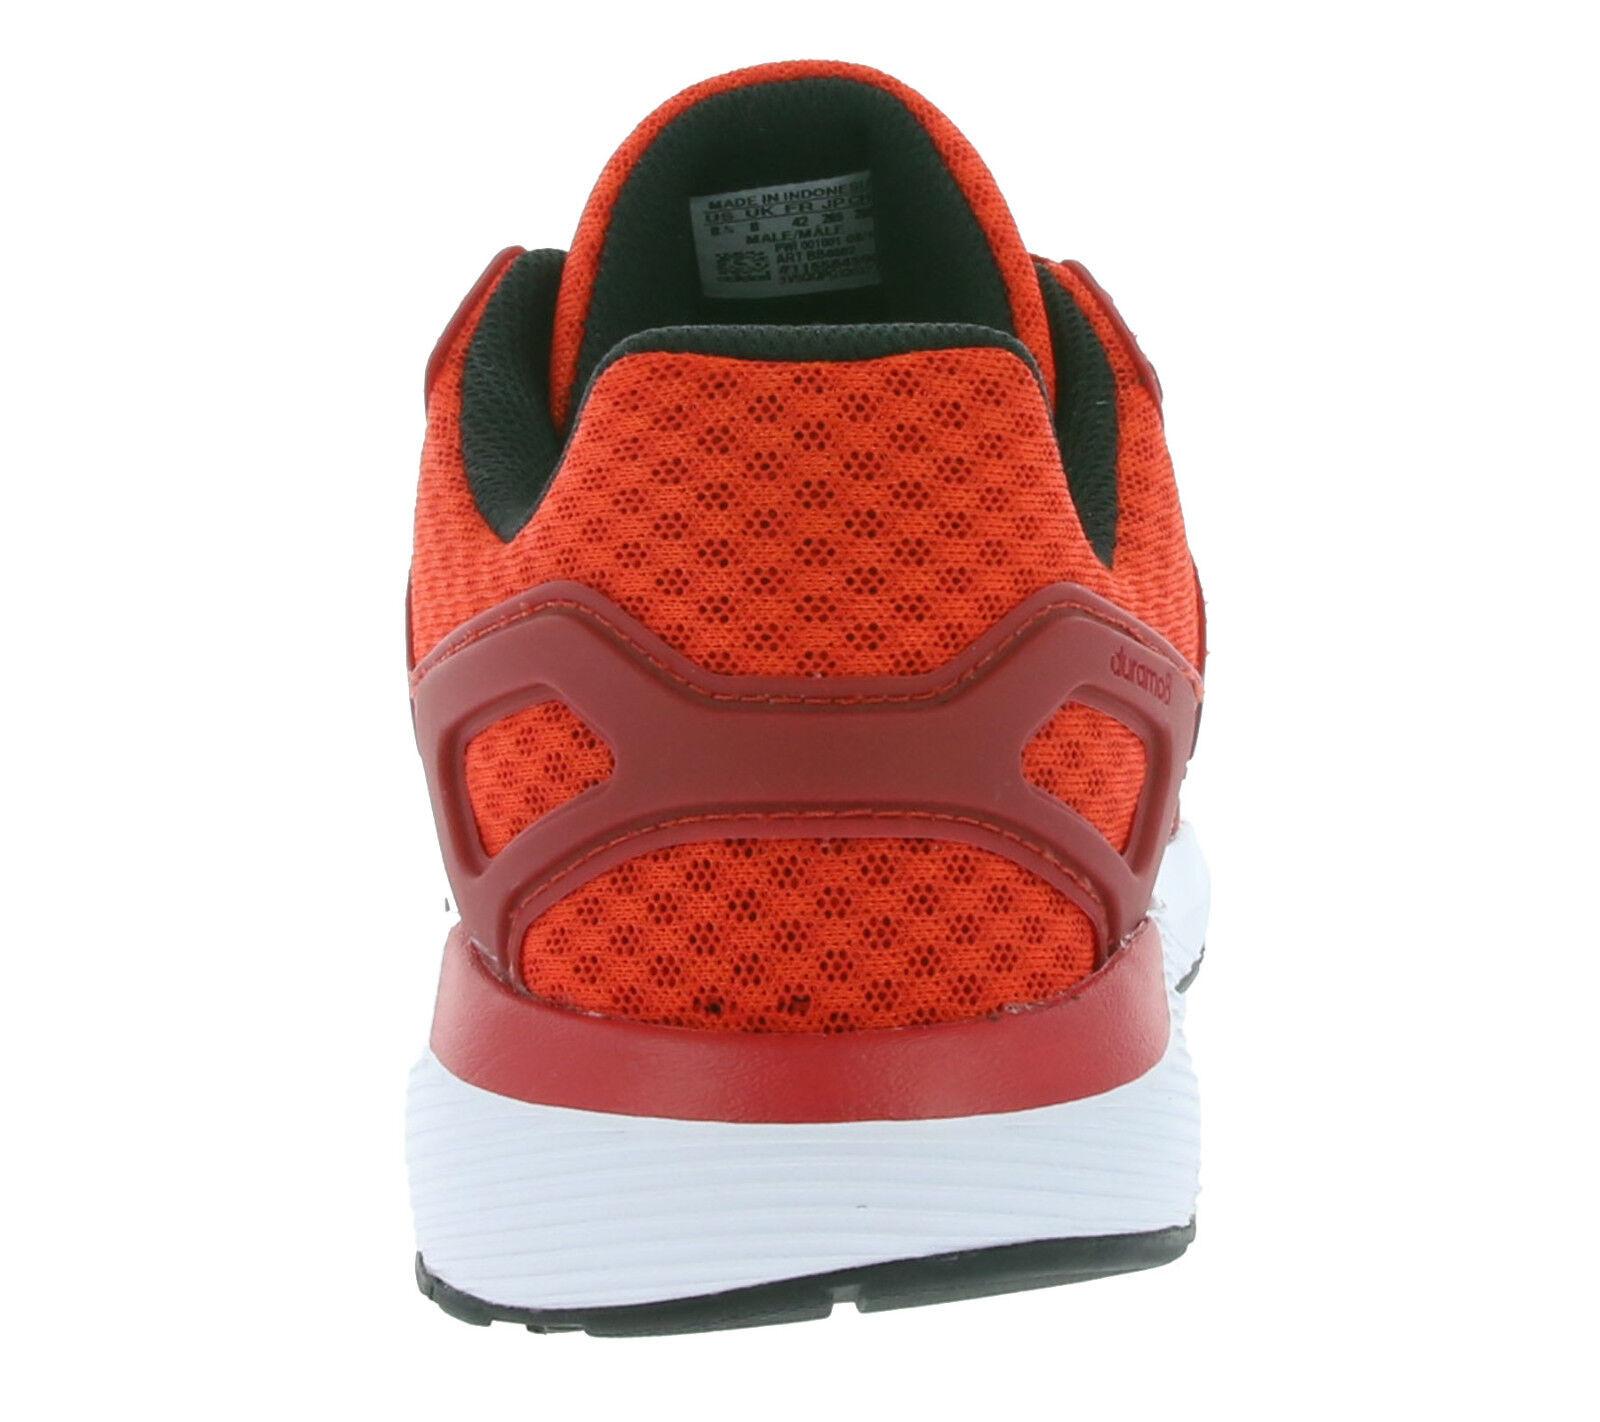 new concept a3508 75b3b ... Zapatos de Hombre Correr Tenis Duramo Adidas 8 Rojo Cloudfoam Cloudfoam  Cloudfoam Adiwear BB4662 Hombre Nuevo ...